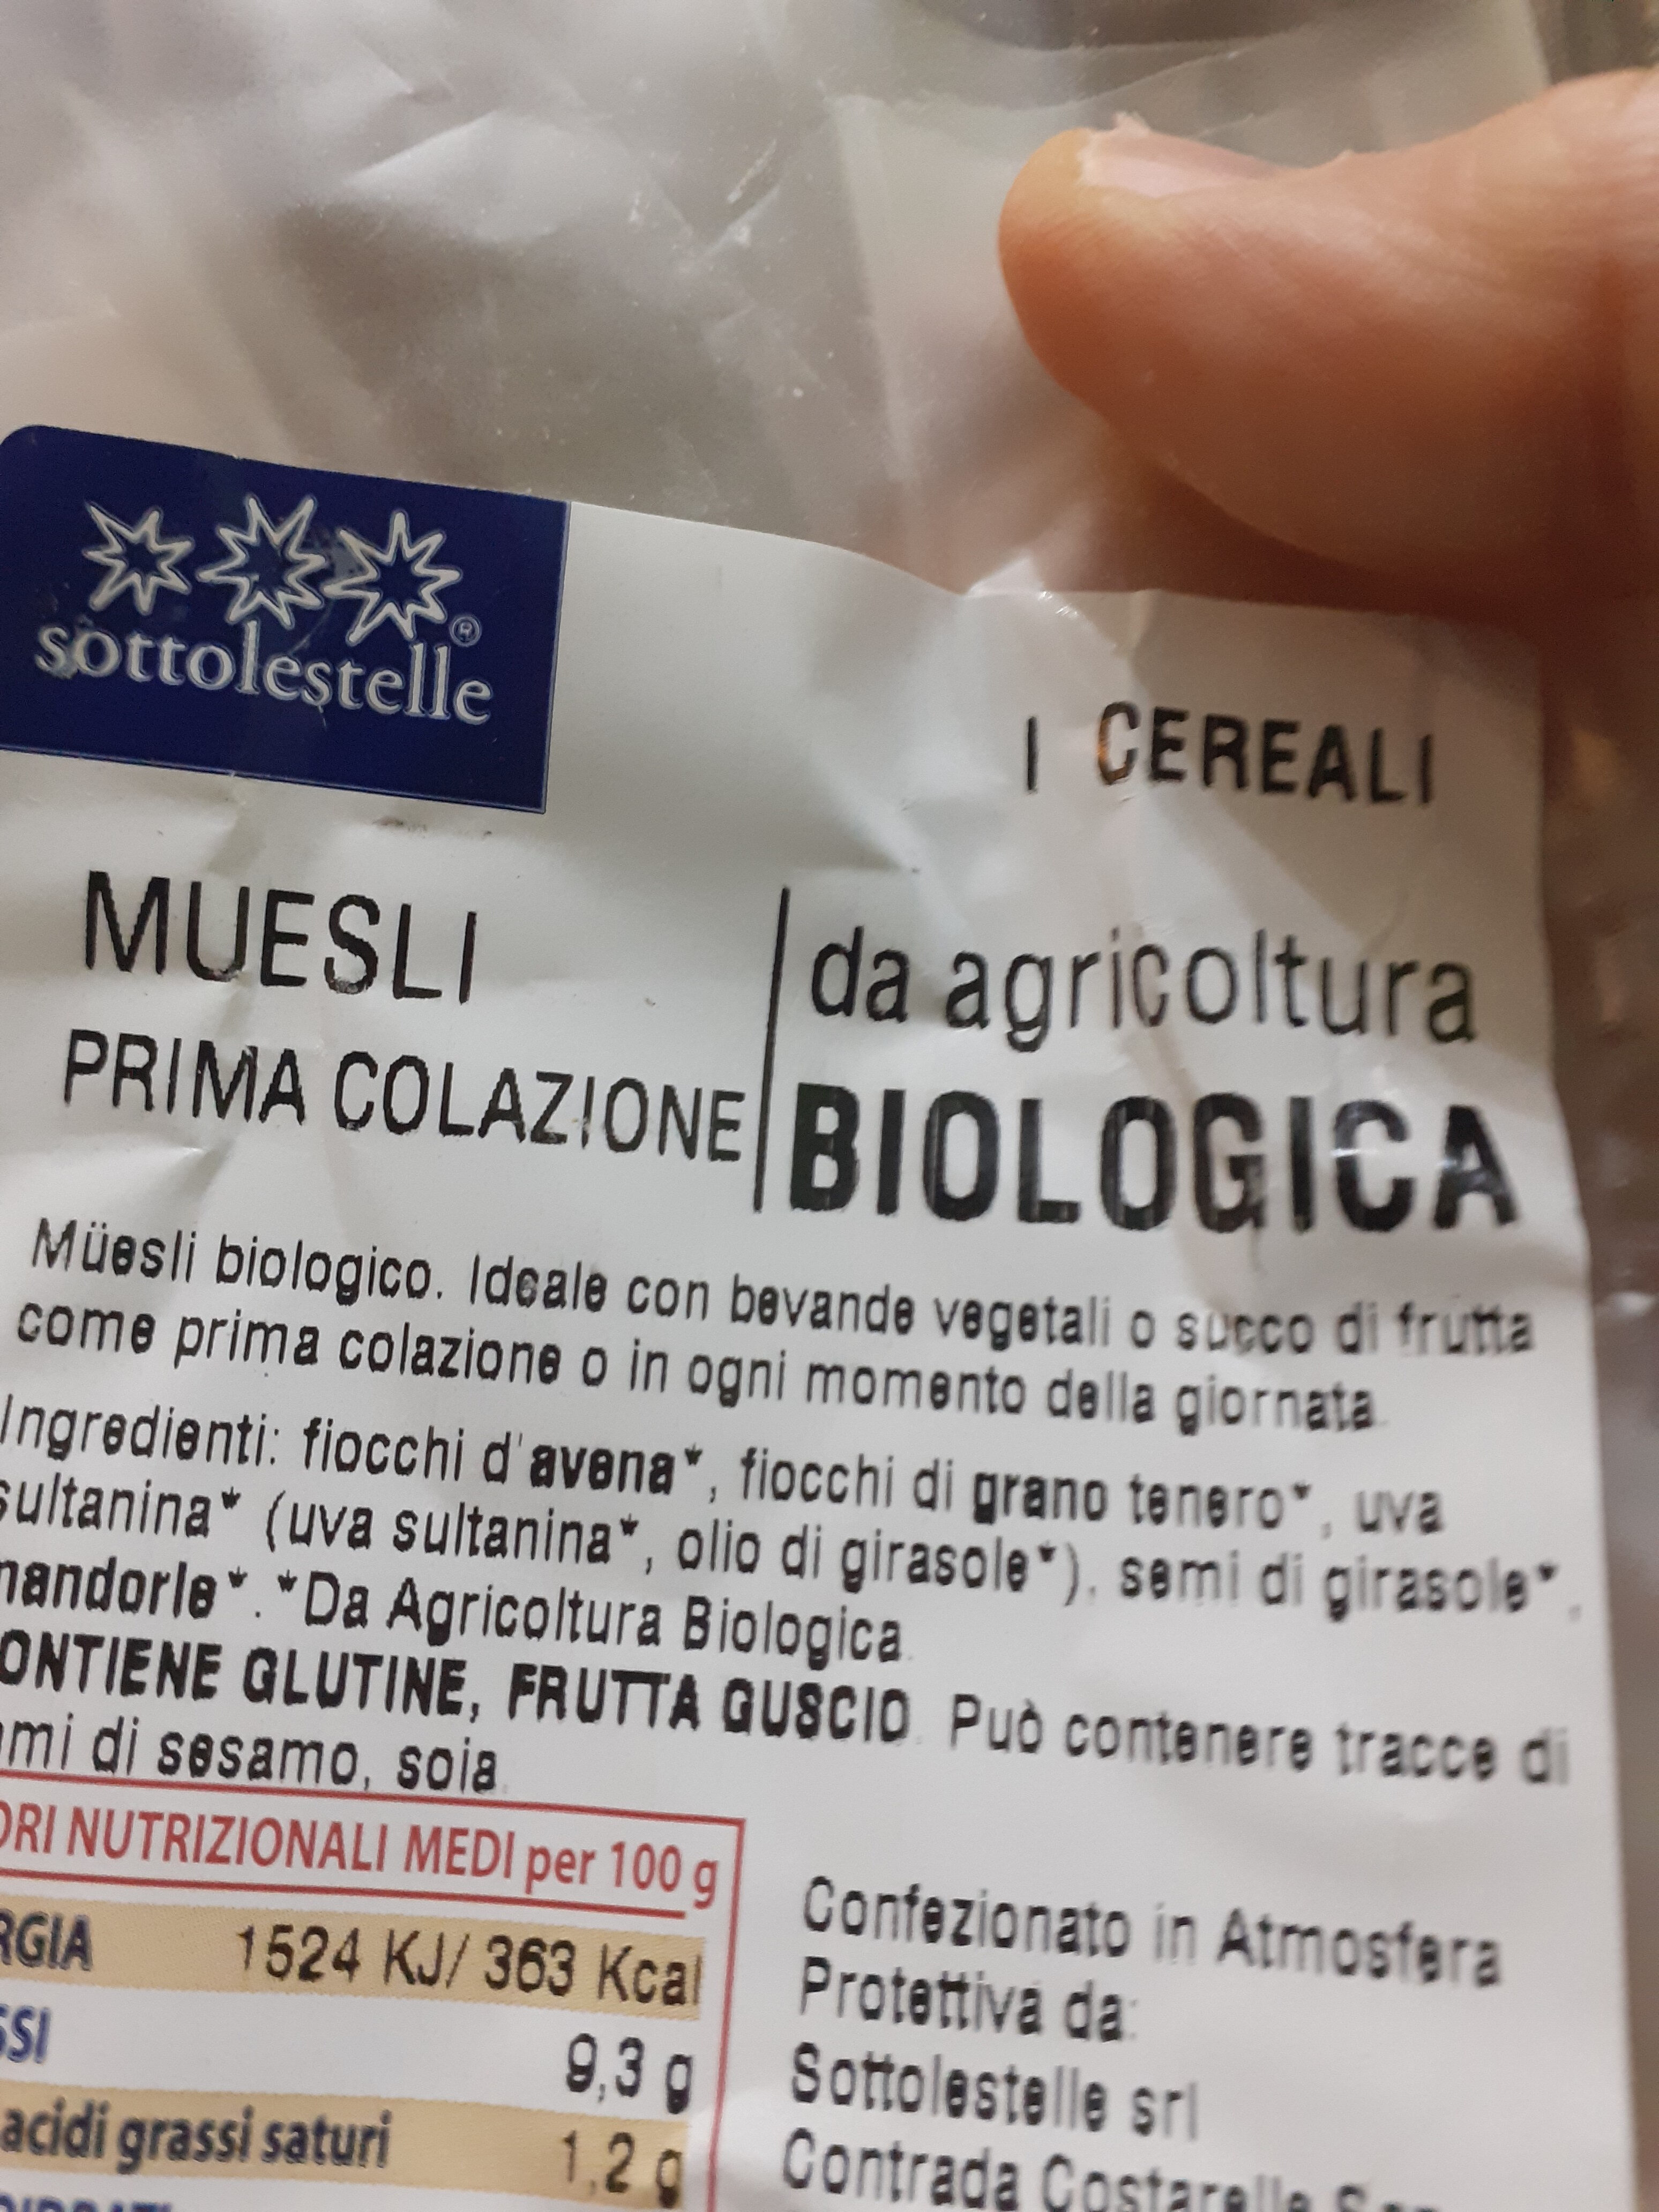 Muesli prima colazione - Ingredients - it